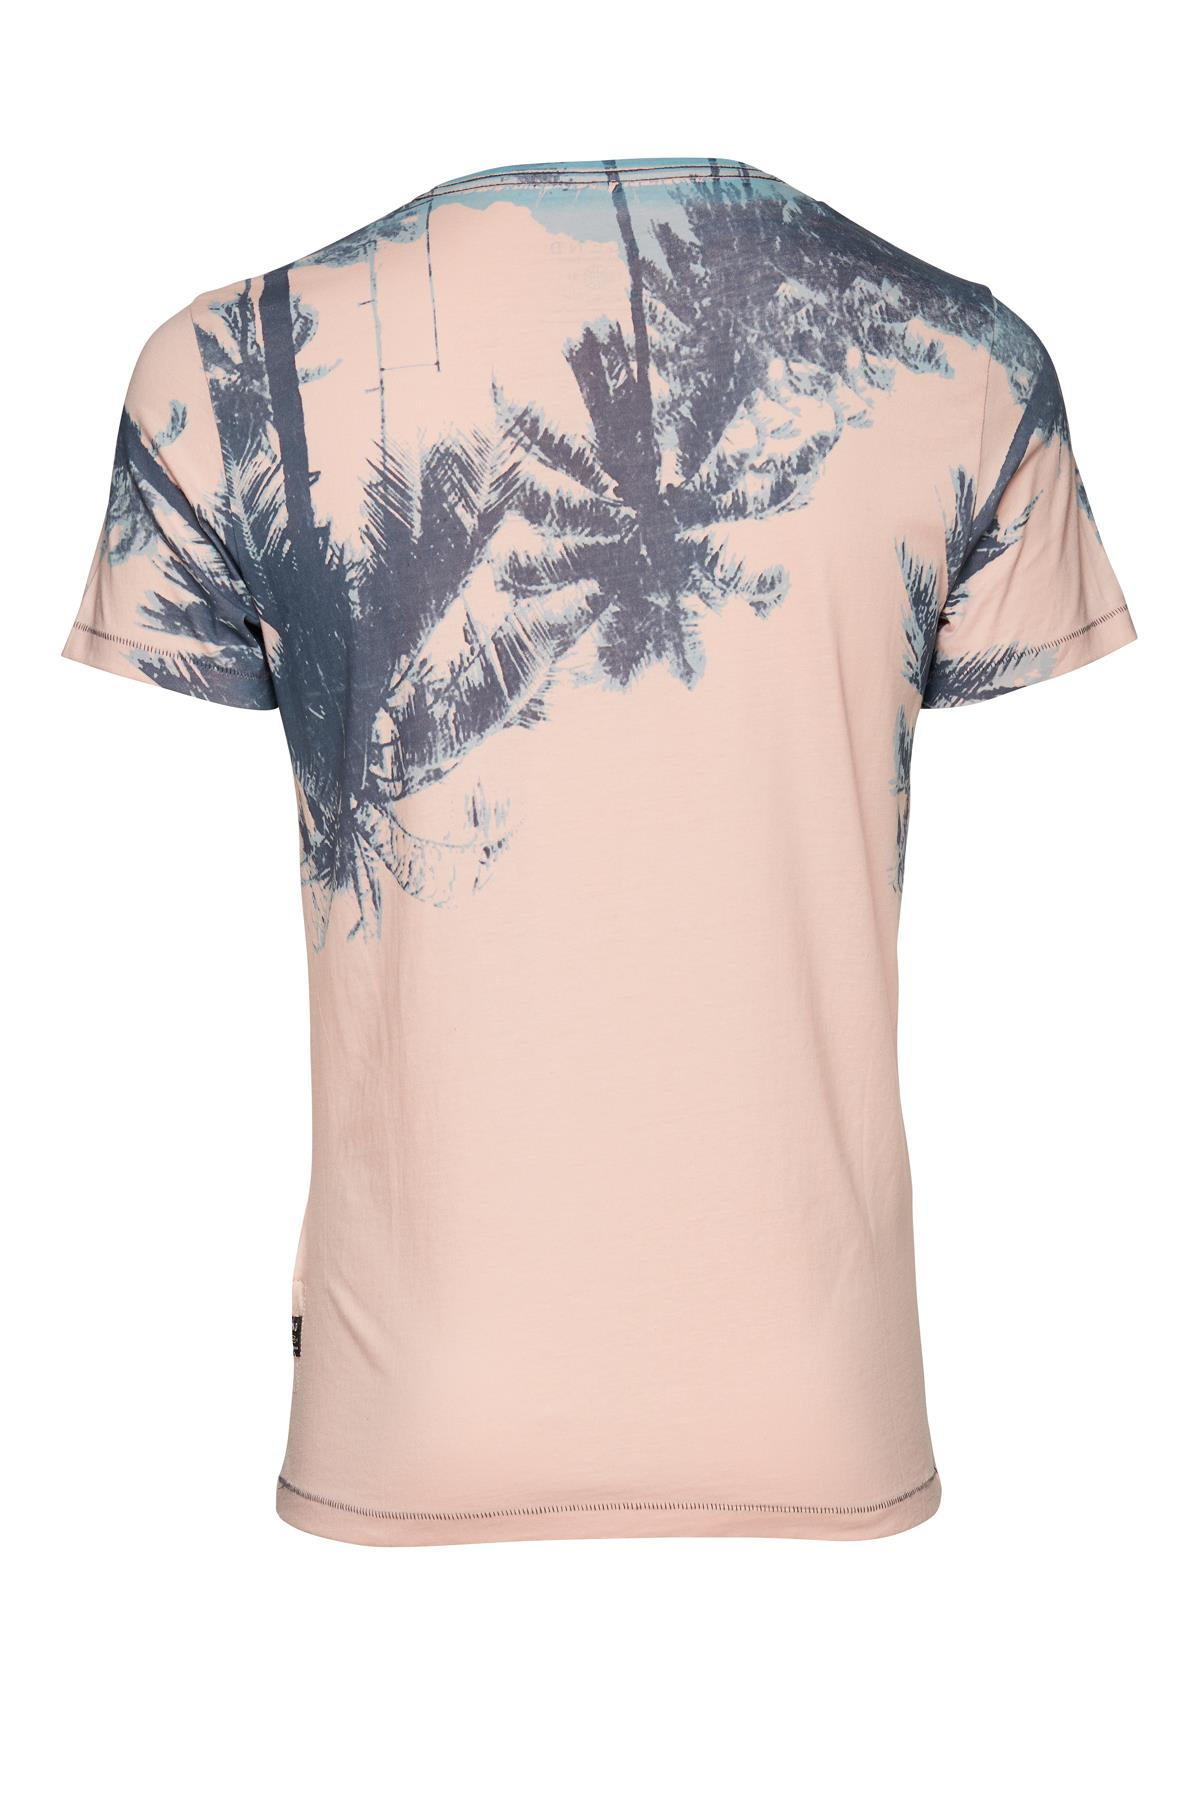 Rosa/grå T-shirt – Køb Rosa/grå T-shirt fra str. M-XXL her